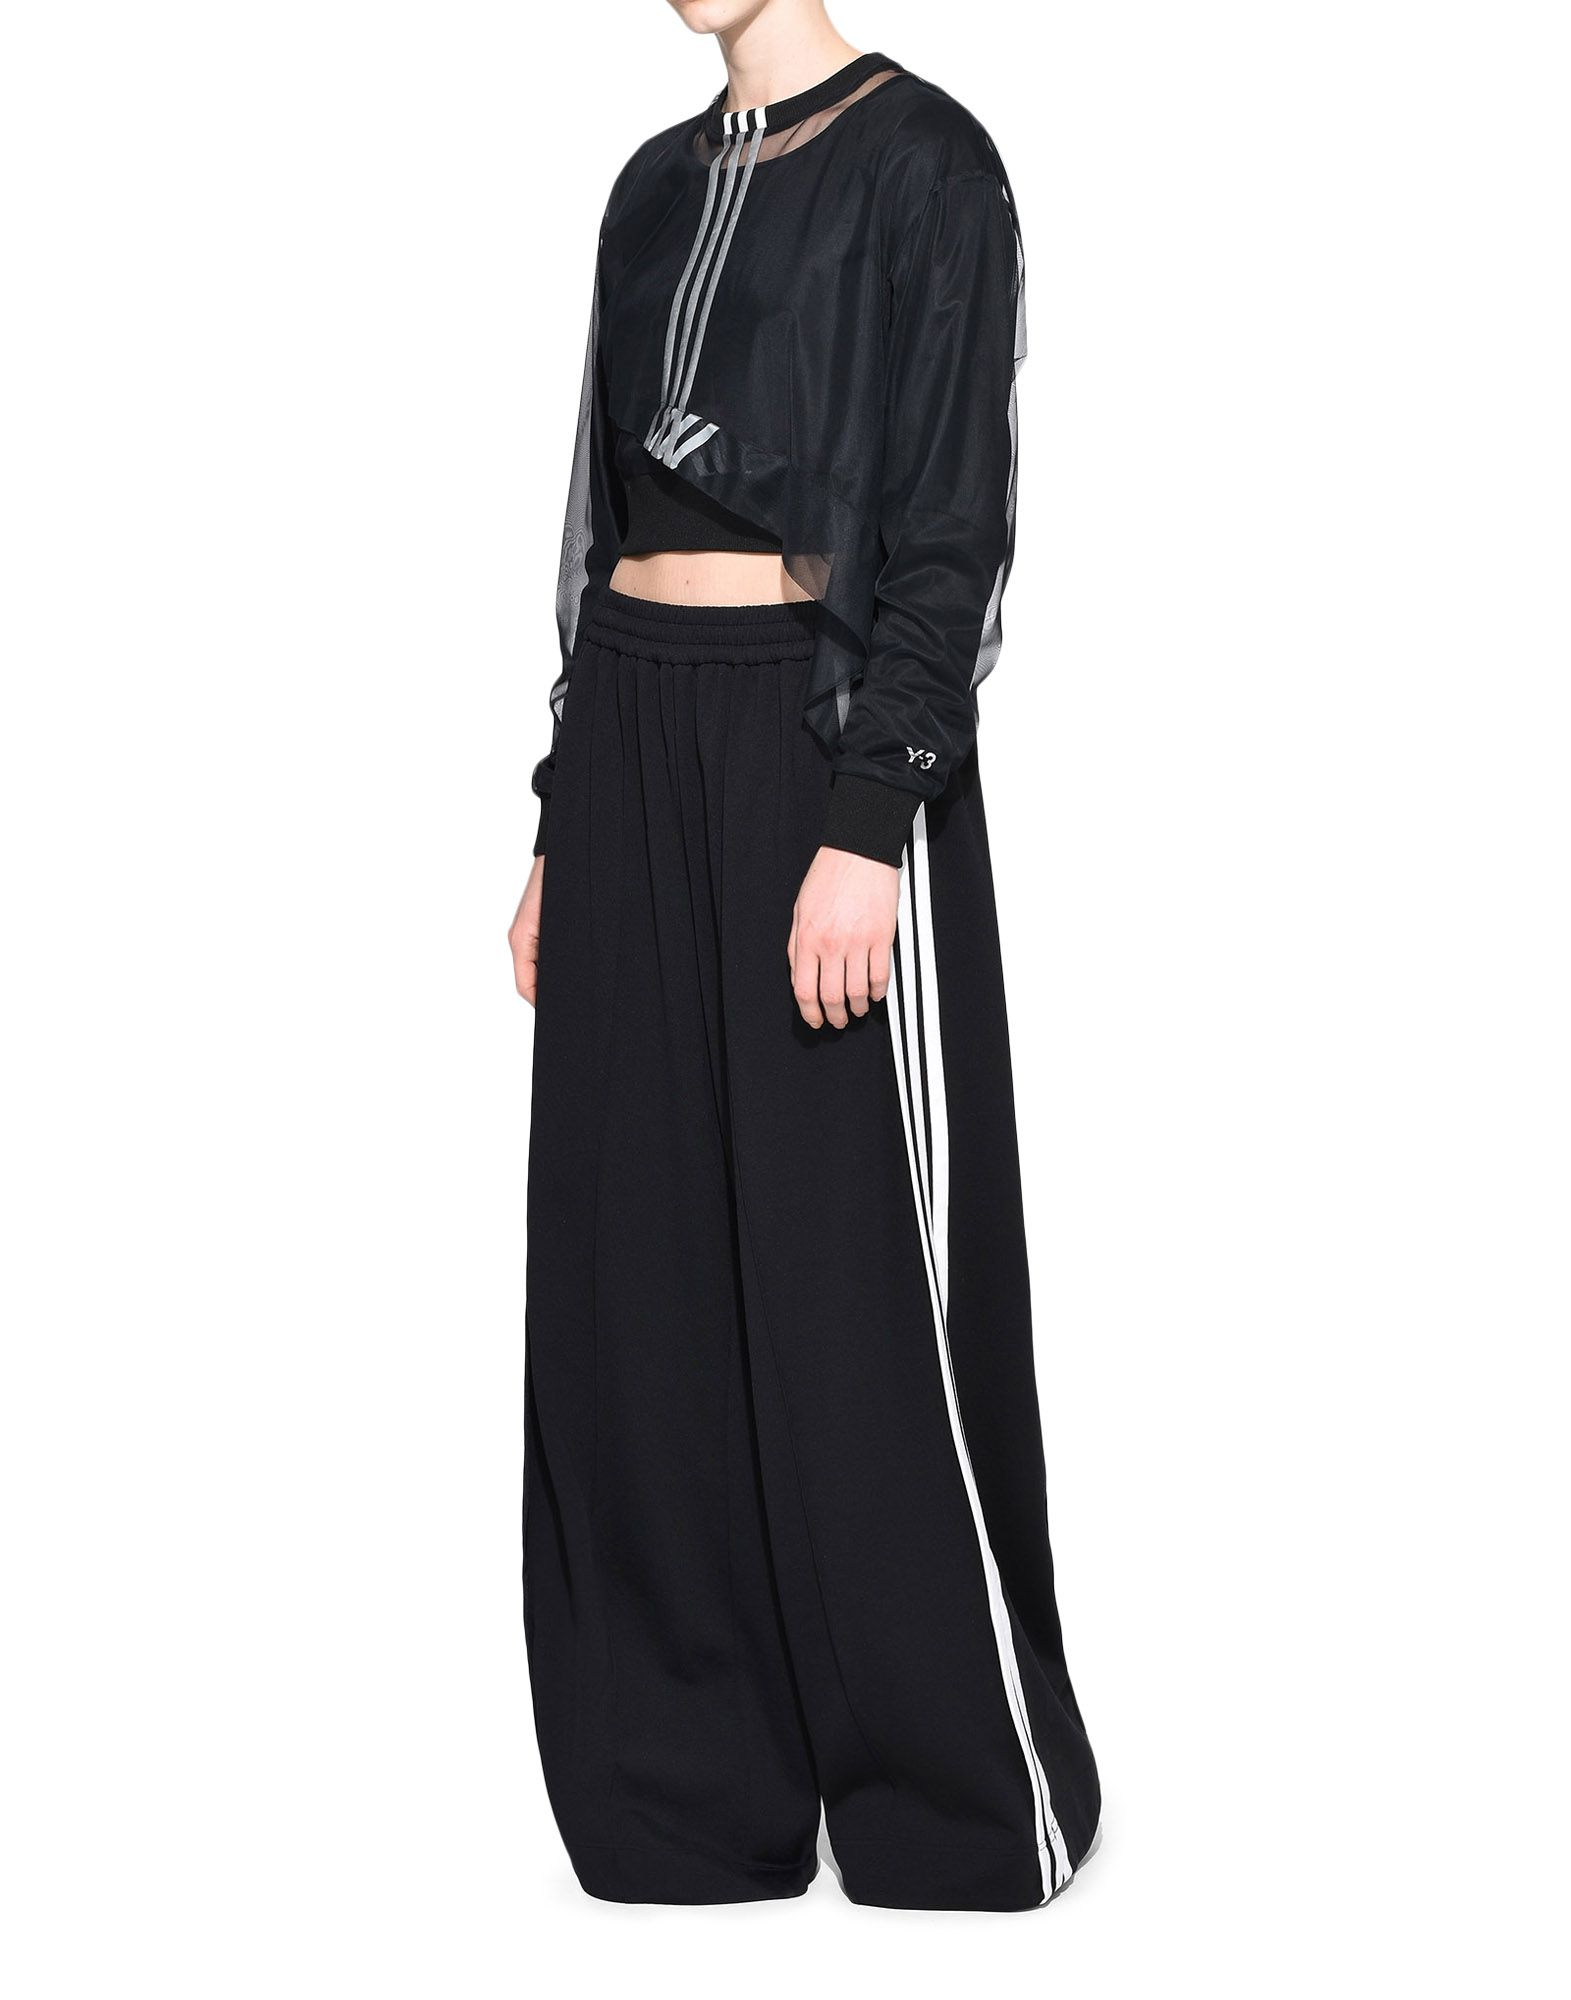 Y-3 Y-3 3-Stripes Mesh Cropped Tee Long sleeve t-shirt Woman a